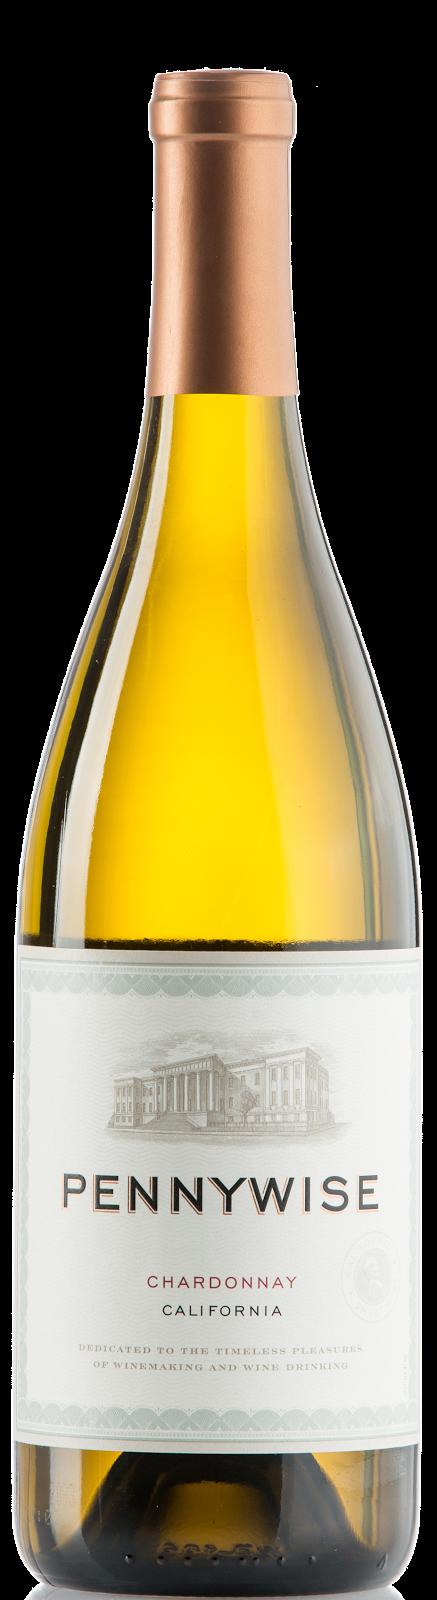 bottle of Pennywise Chardonnay